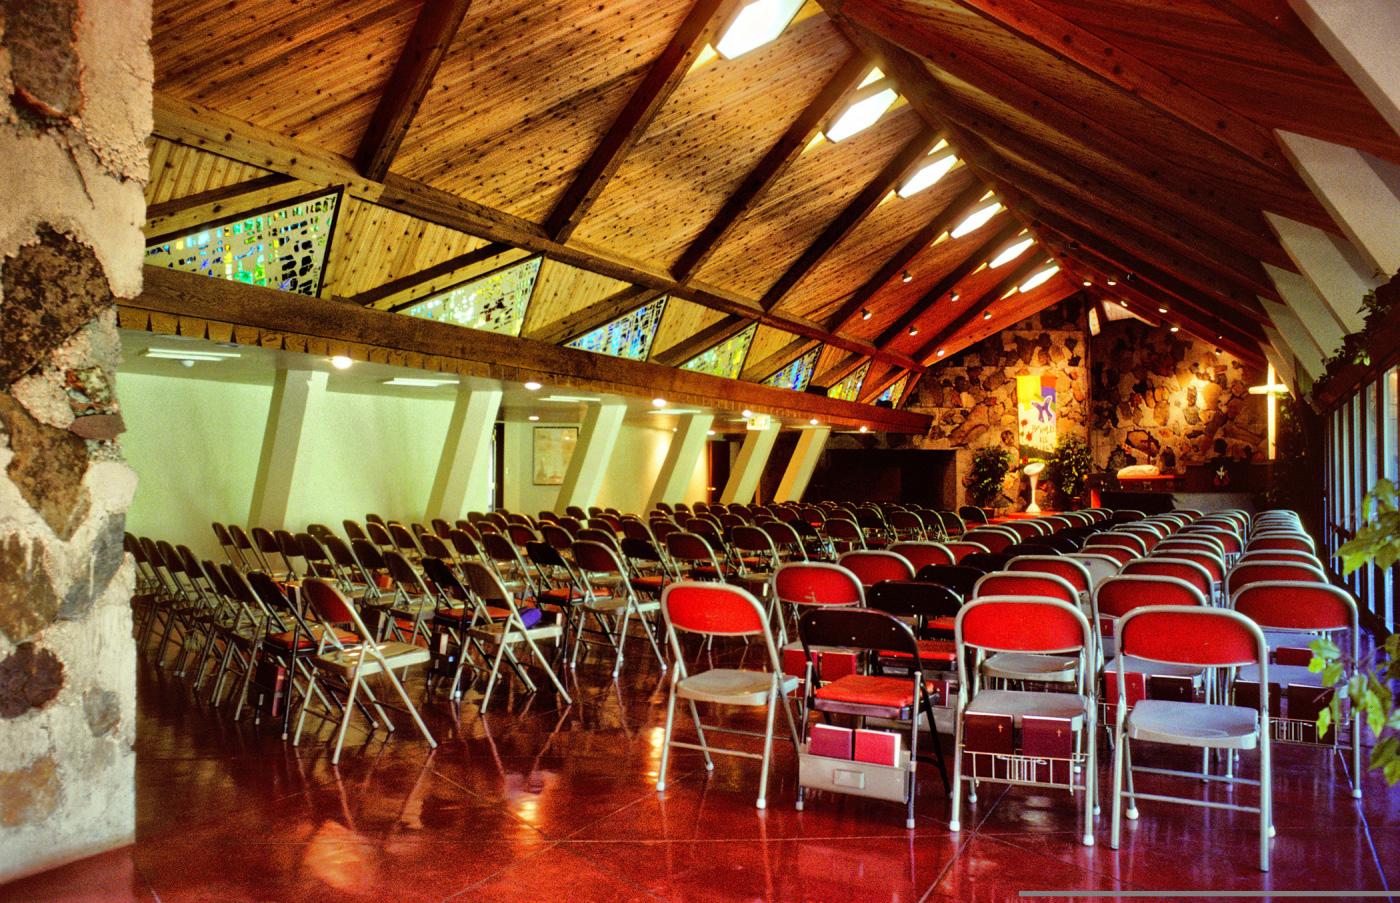 Pilgrim Congregational church. Photography: Pat Mahoney / Frank Lloyd Wright Building Conservancy